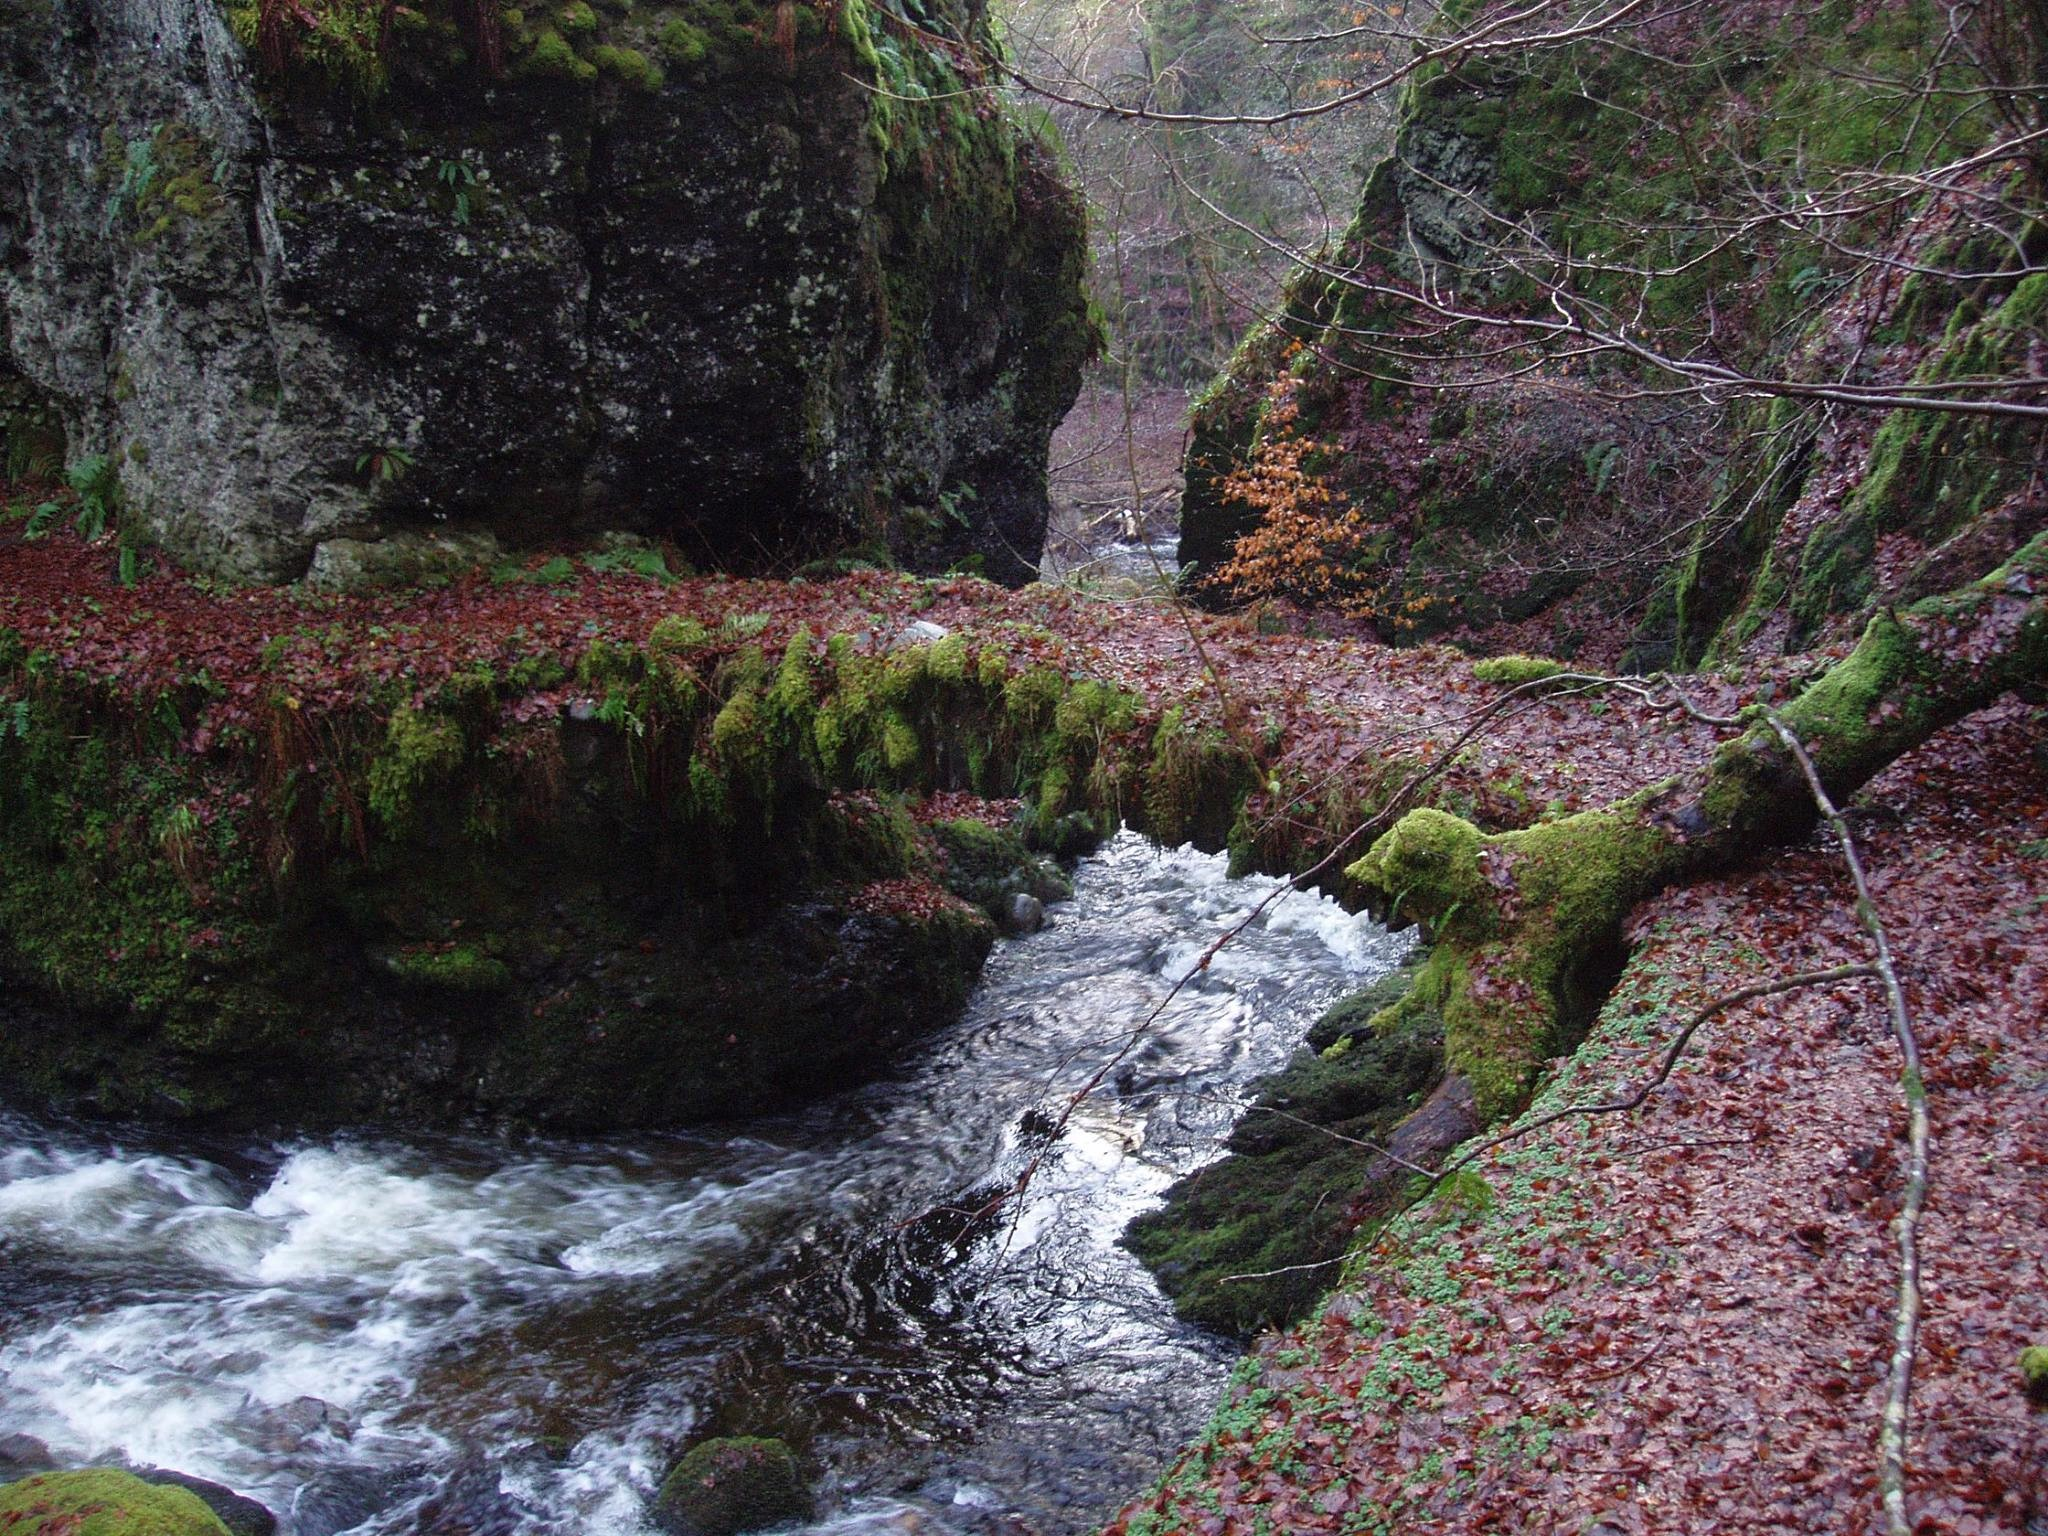 Bridge at Turret falls